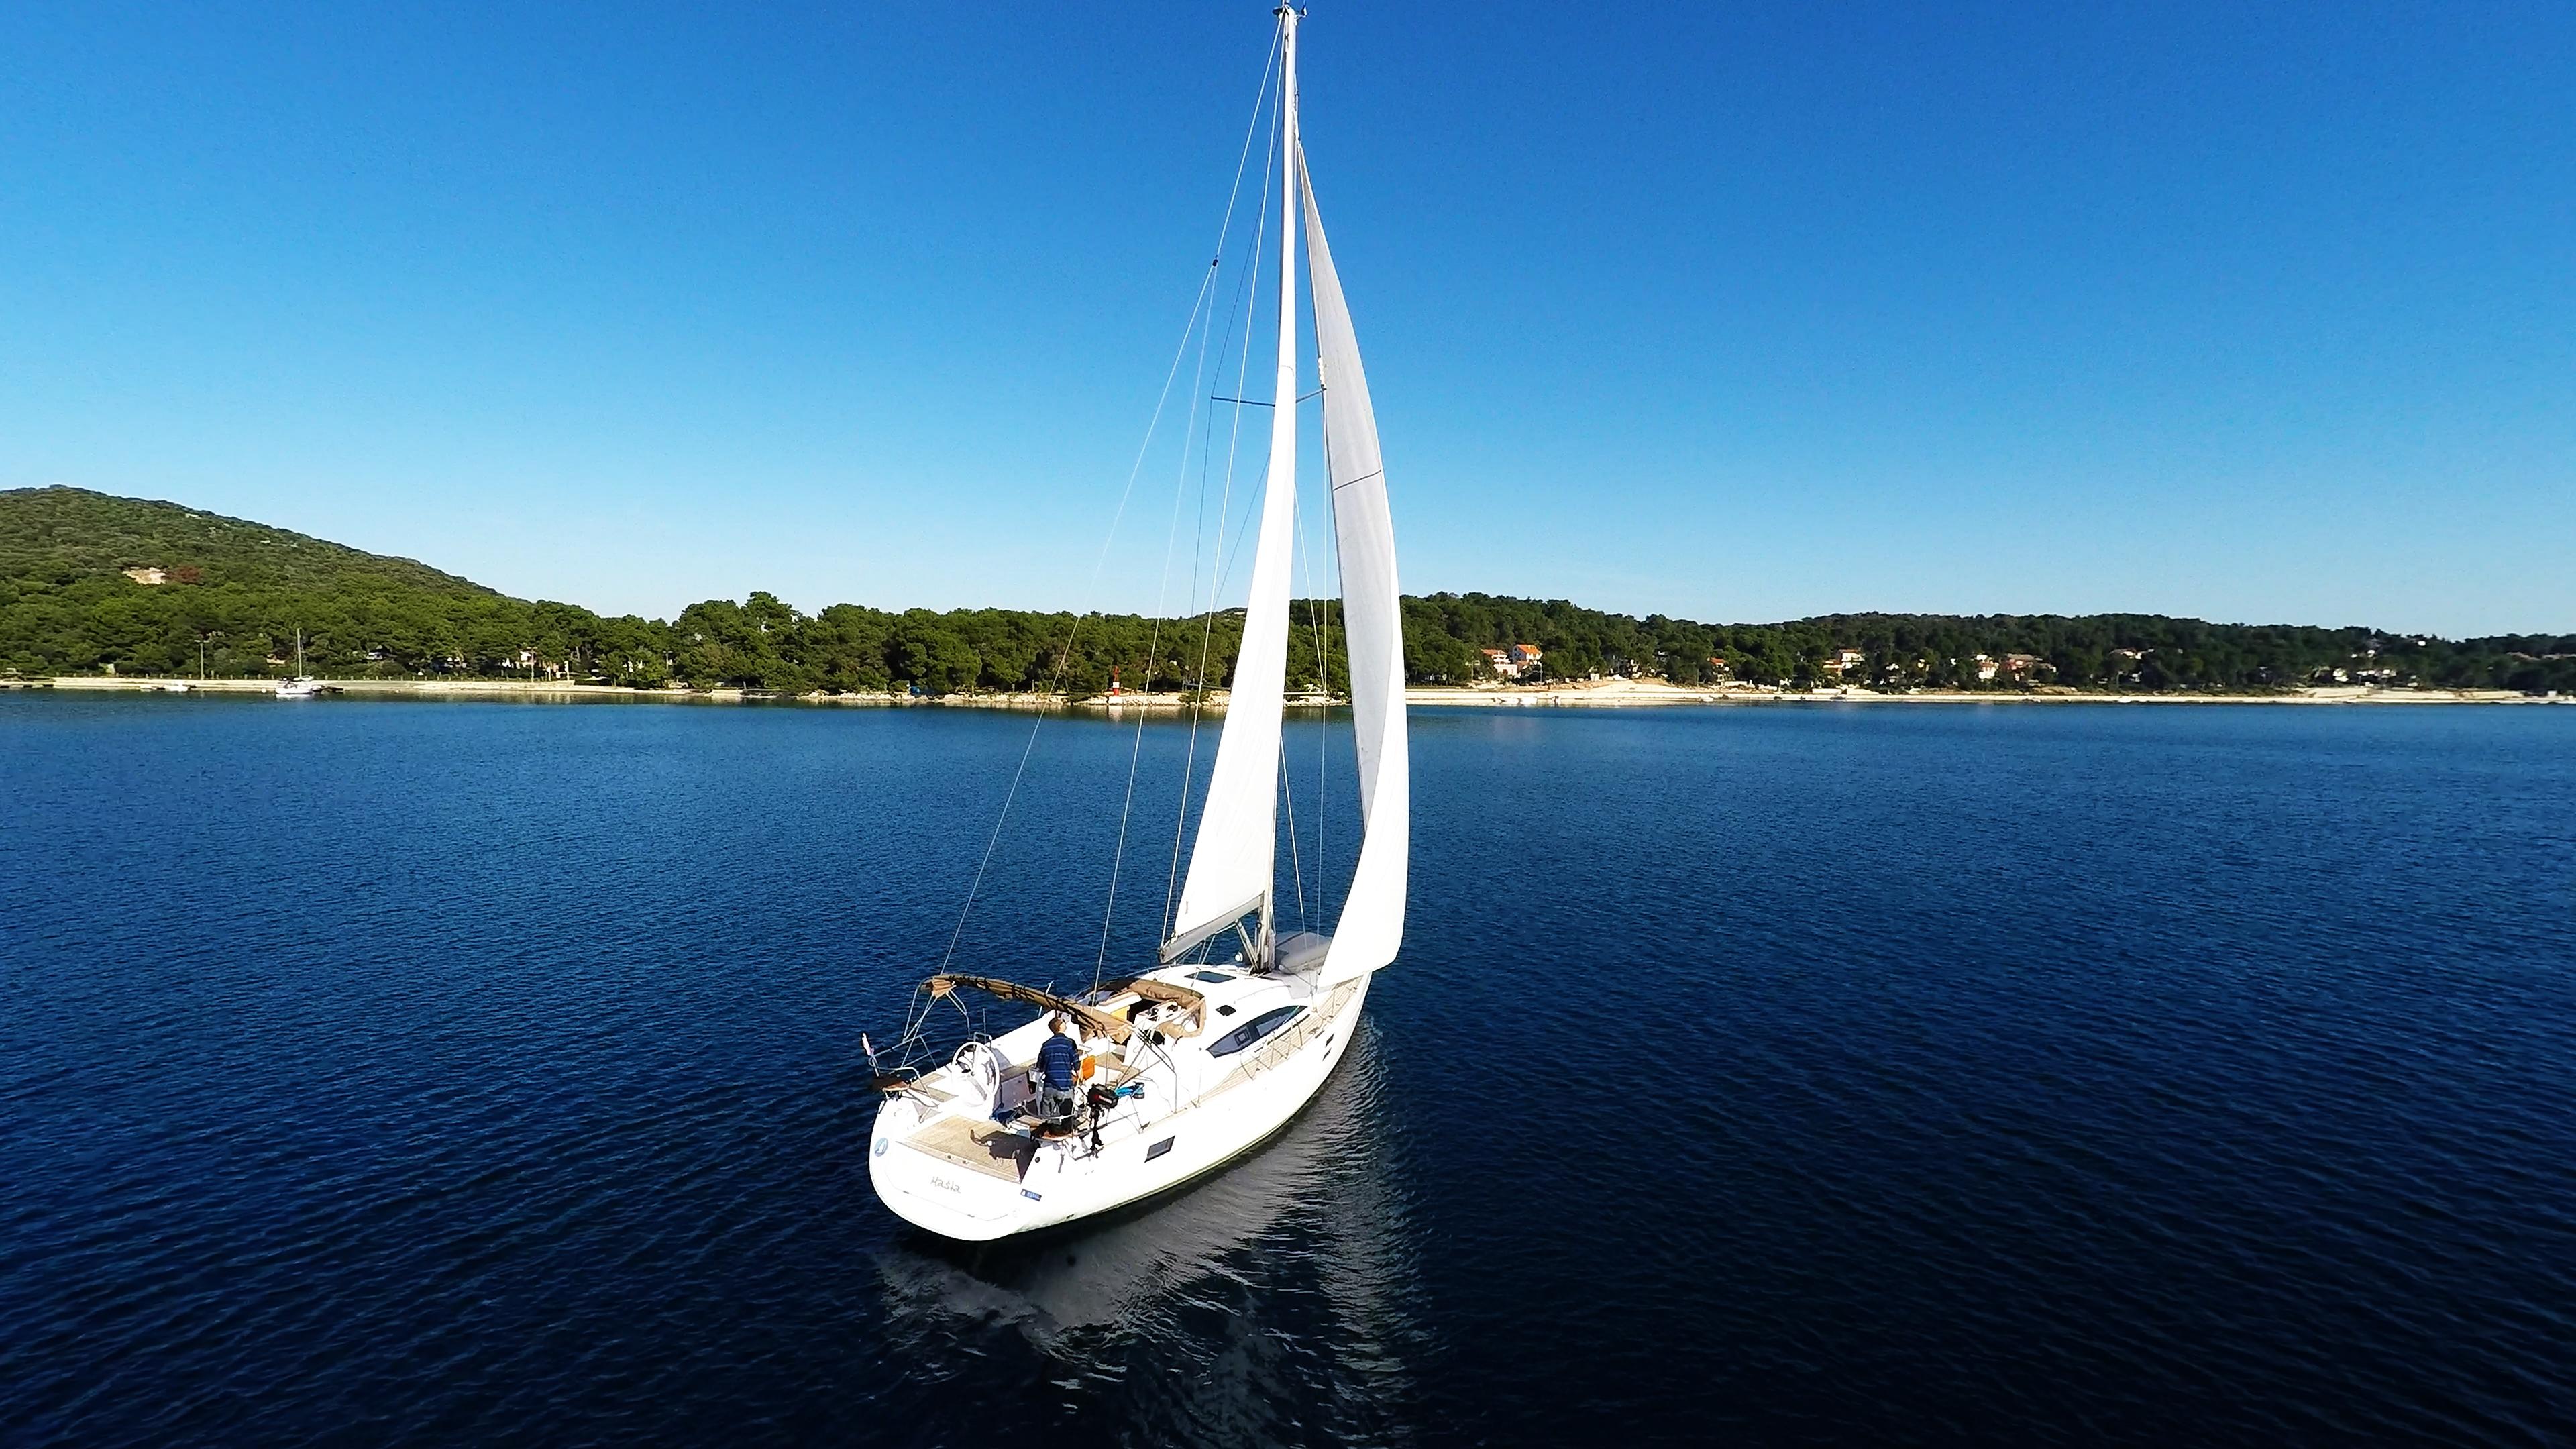 barcha a vela barca a velanella baia del mare cielo blu vele Croazia yacht a vela